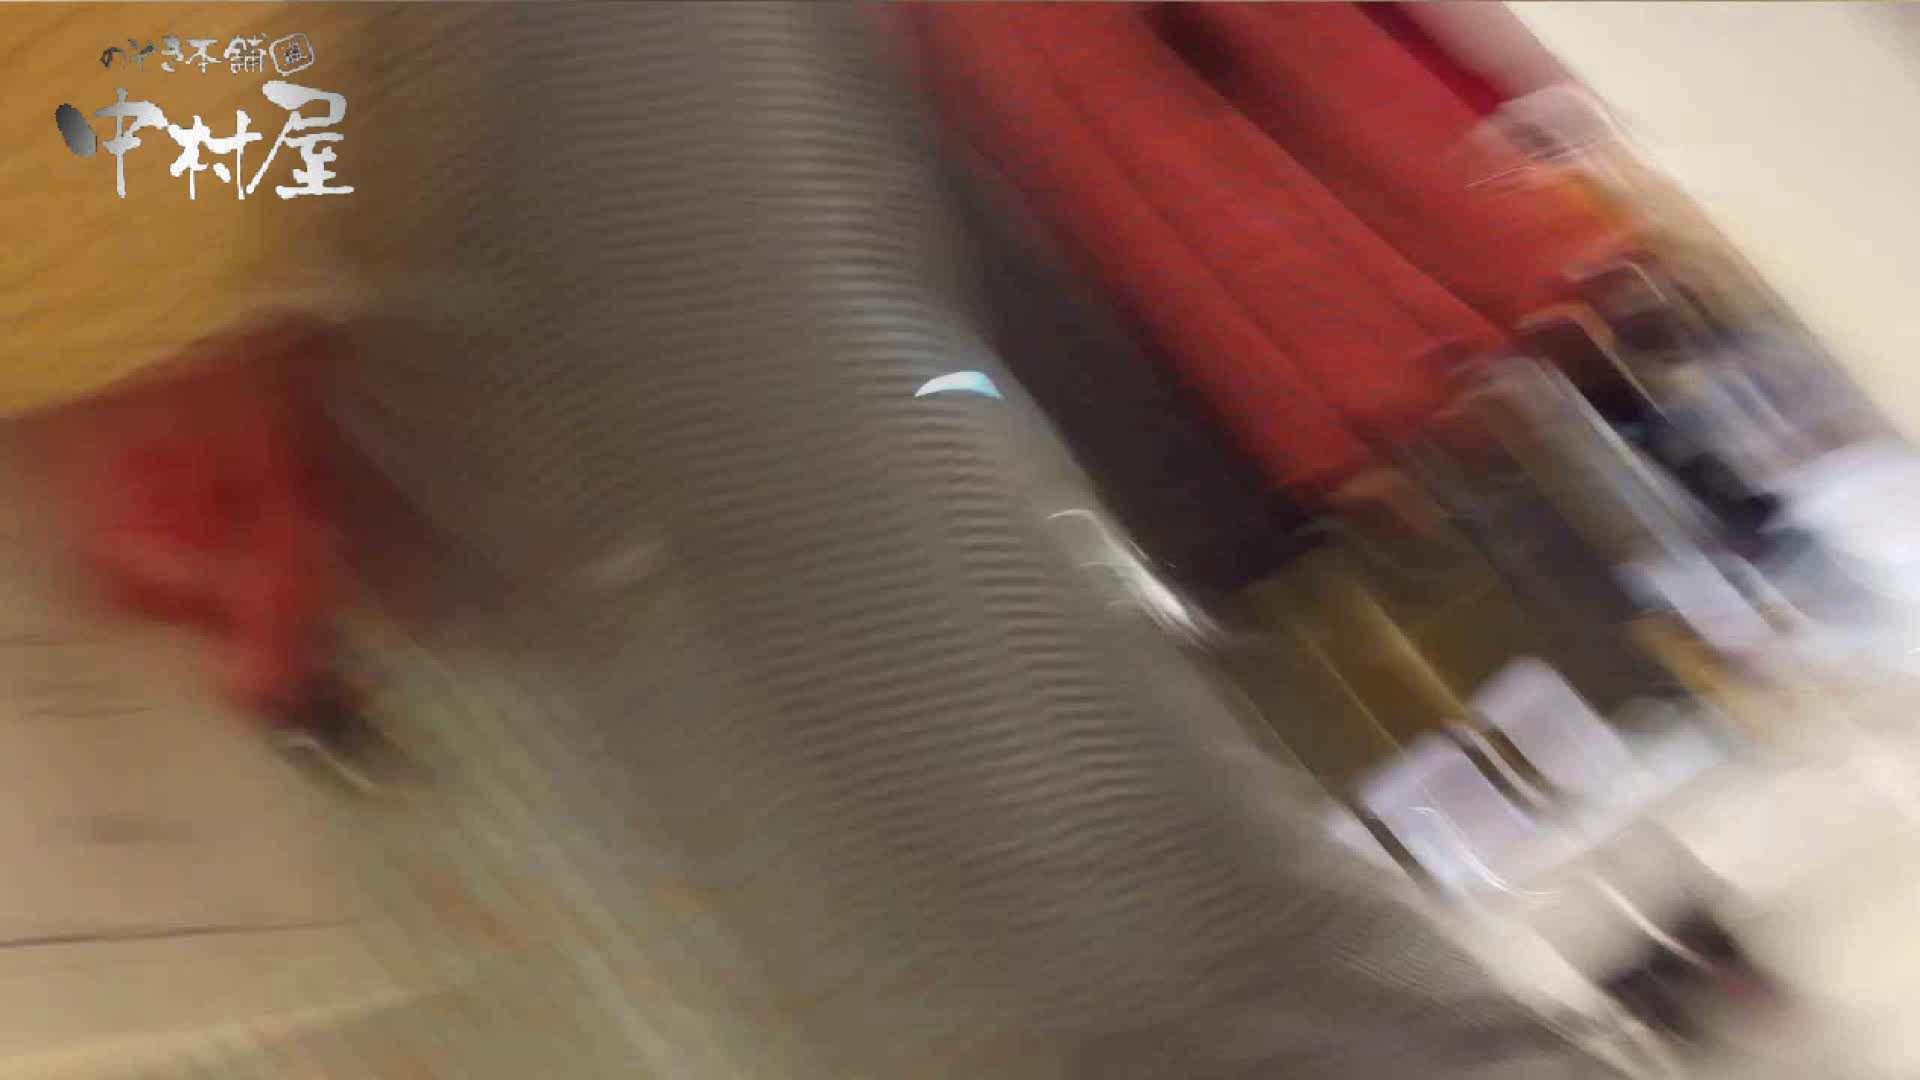 vol.65 美人アパレル胸チラ&パンチラ ムッチリ感がいい感じ花がらパンツさん チラ  106連発 96